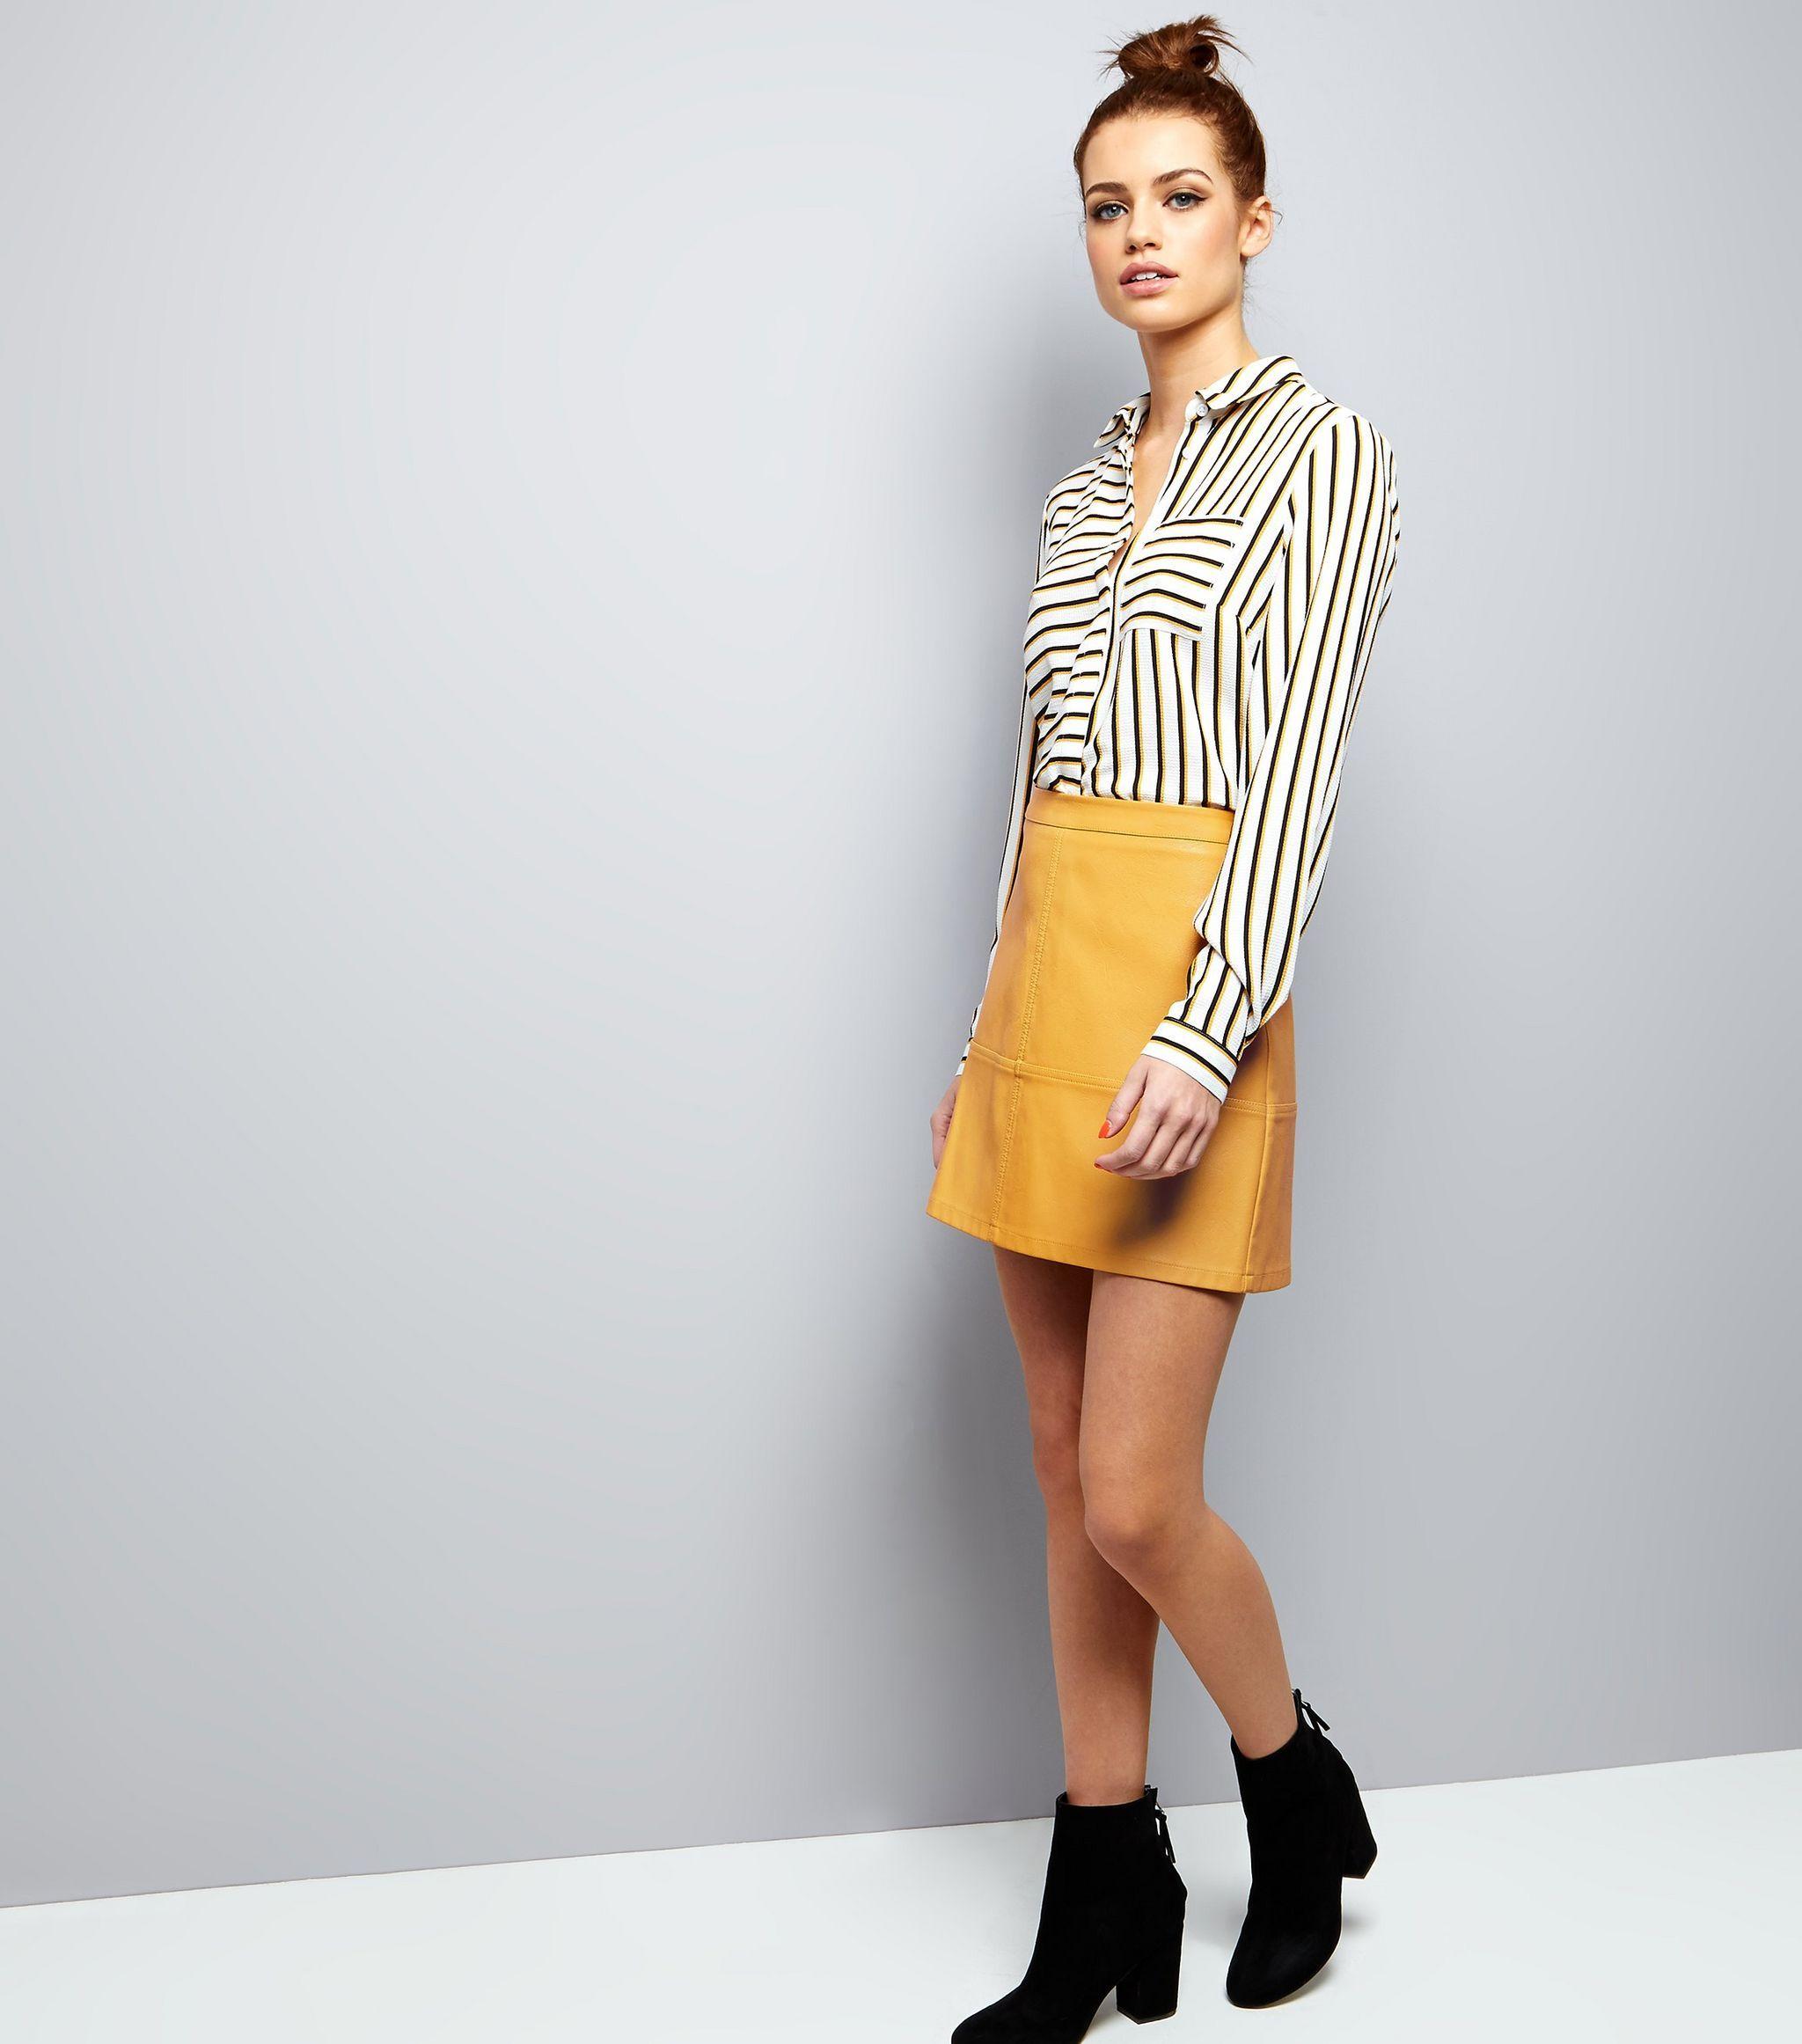 f34b1932e876 Petite - Mini-jupe jaune en similicuir avec coutures apparentes ...